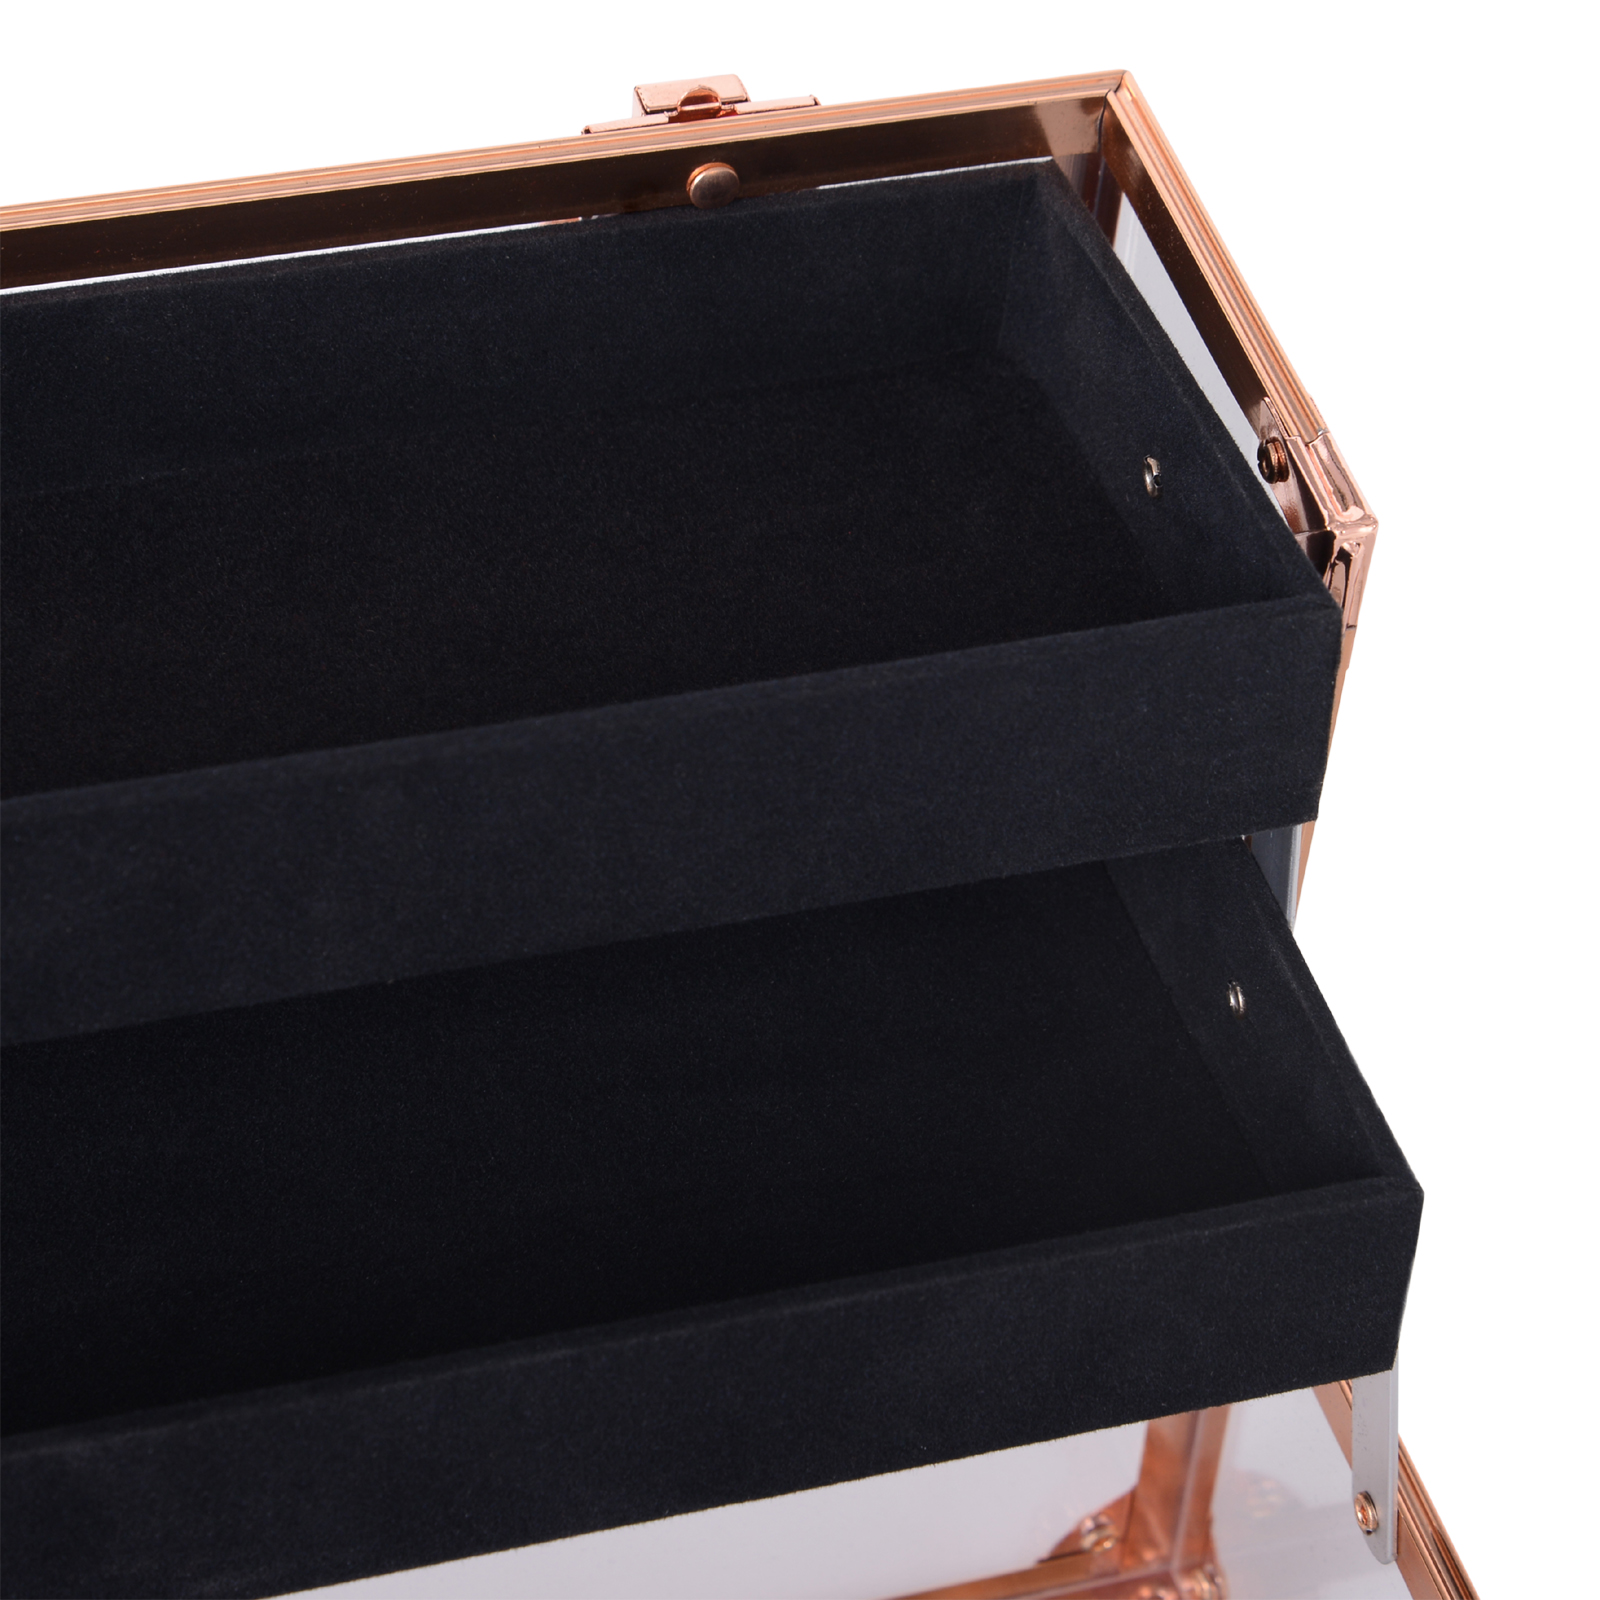 Portable-Makeup-Case-Train-Case-Lockable-Aluminum-with-4-Trays thumbnail 16